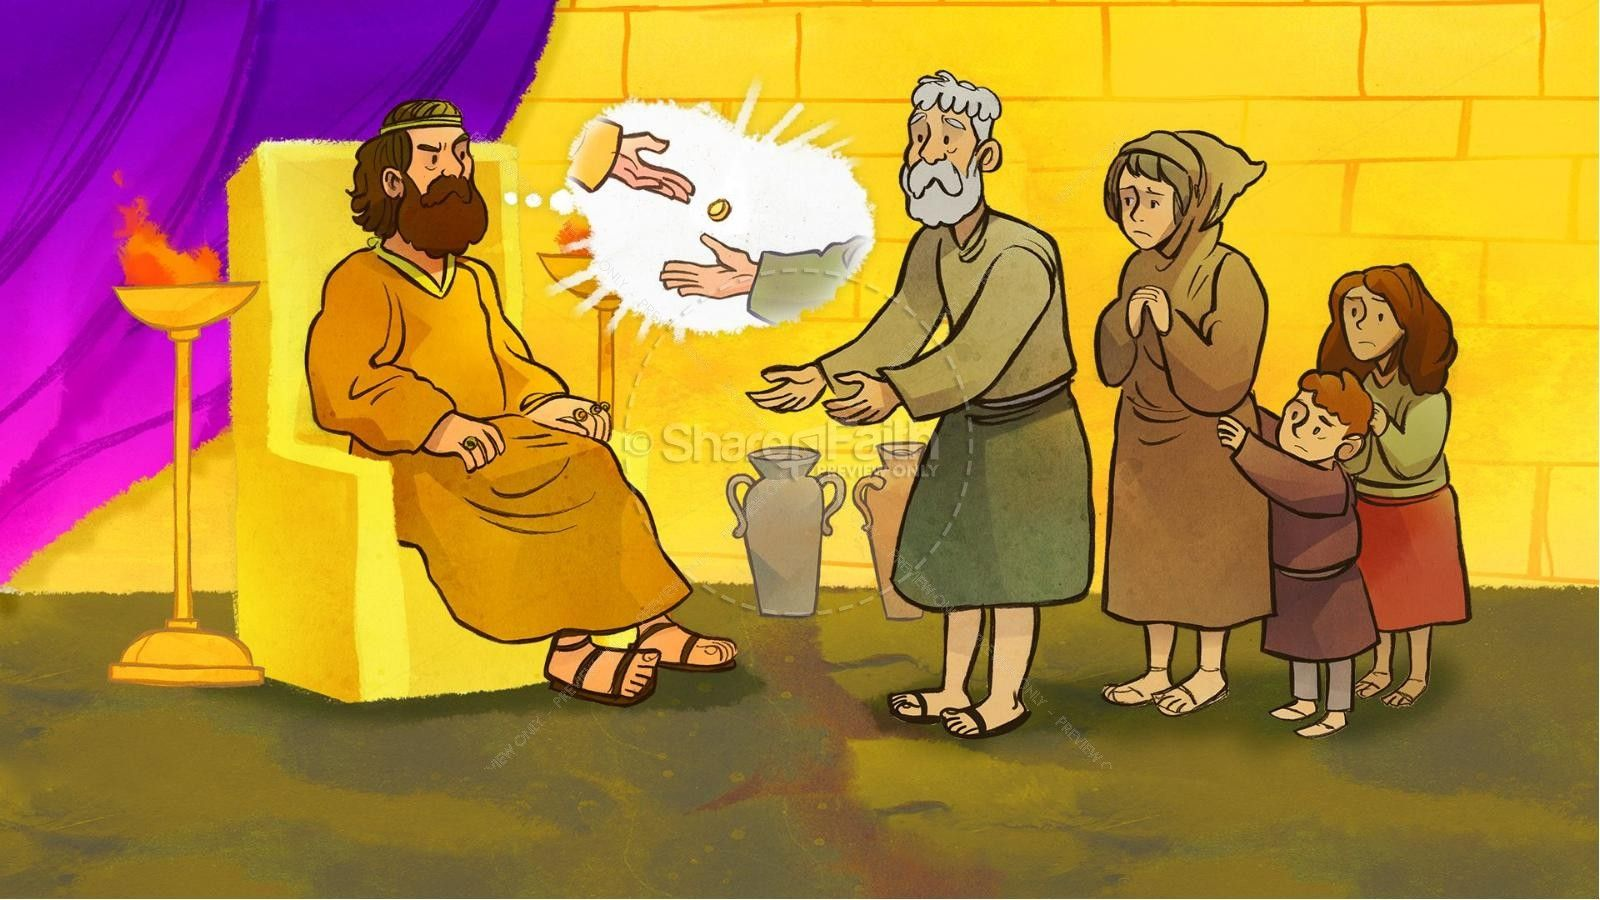 Matthew 18 The Parable of the Unforgiving Servant Kids Bible Story | Kids  Bible Stories | Bible stories for kids, Bible for kids, Parables